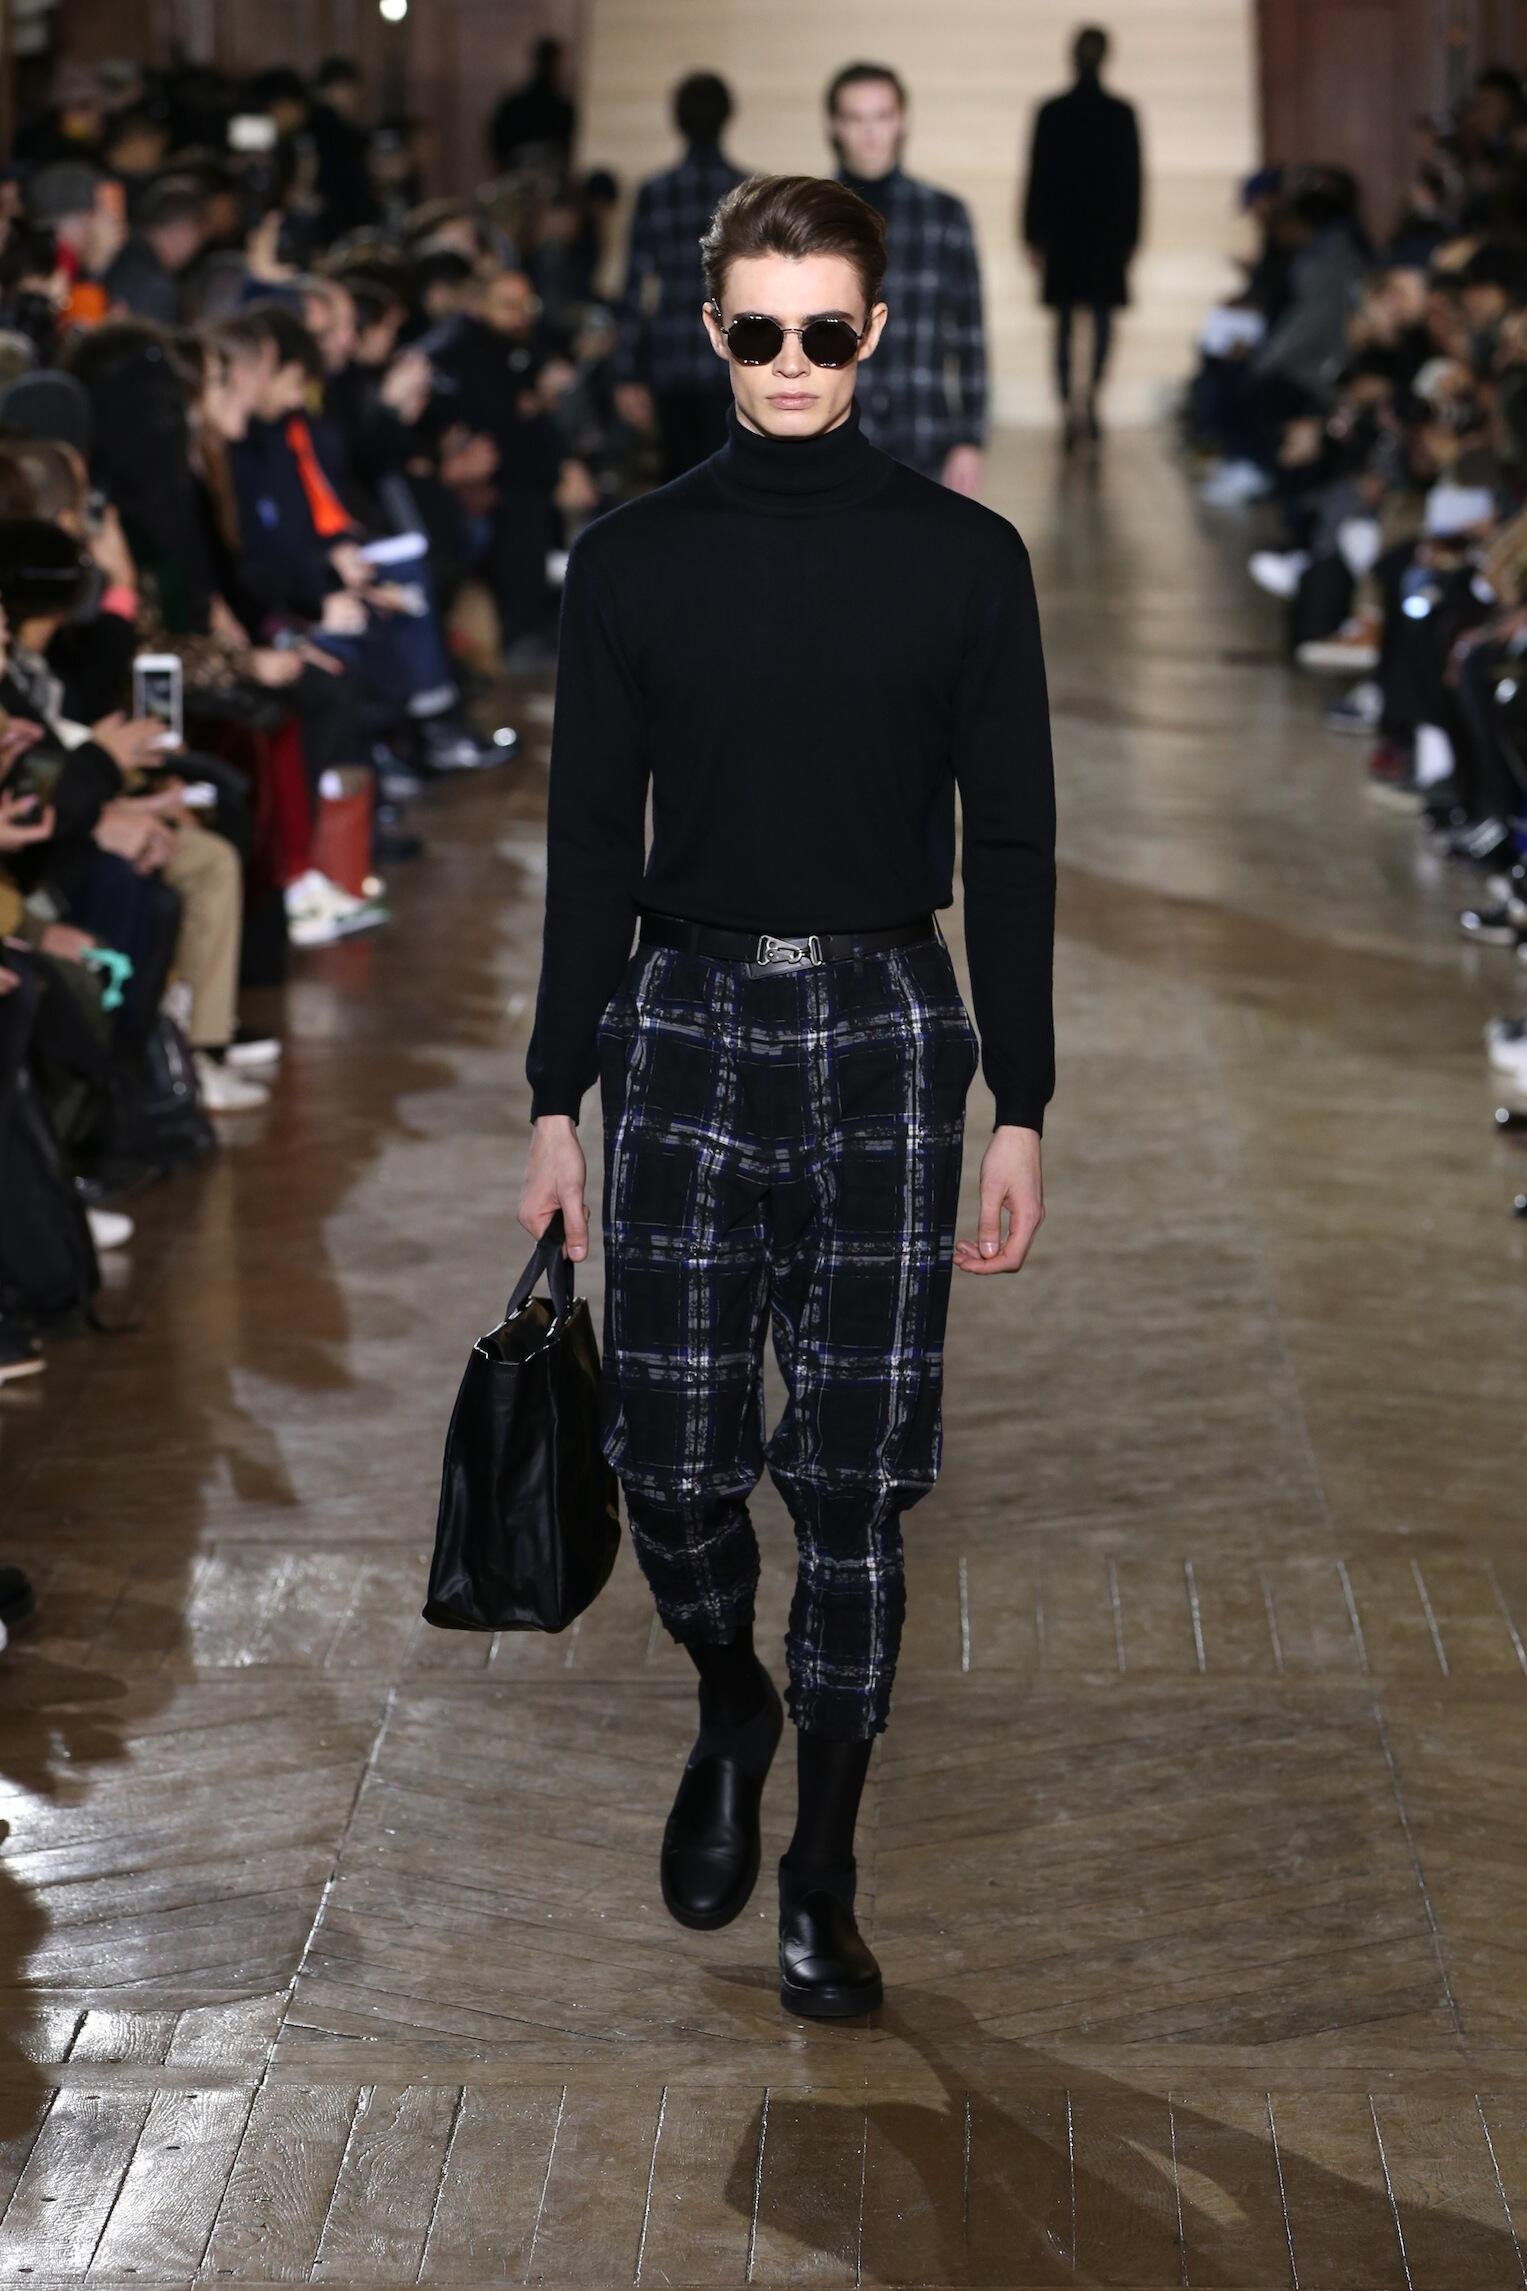 2017 Catwalk Issey Miyake Man Fashion Show Winter